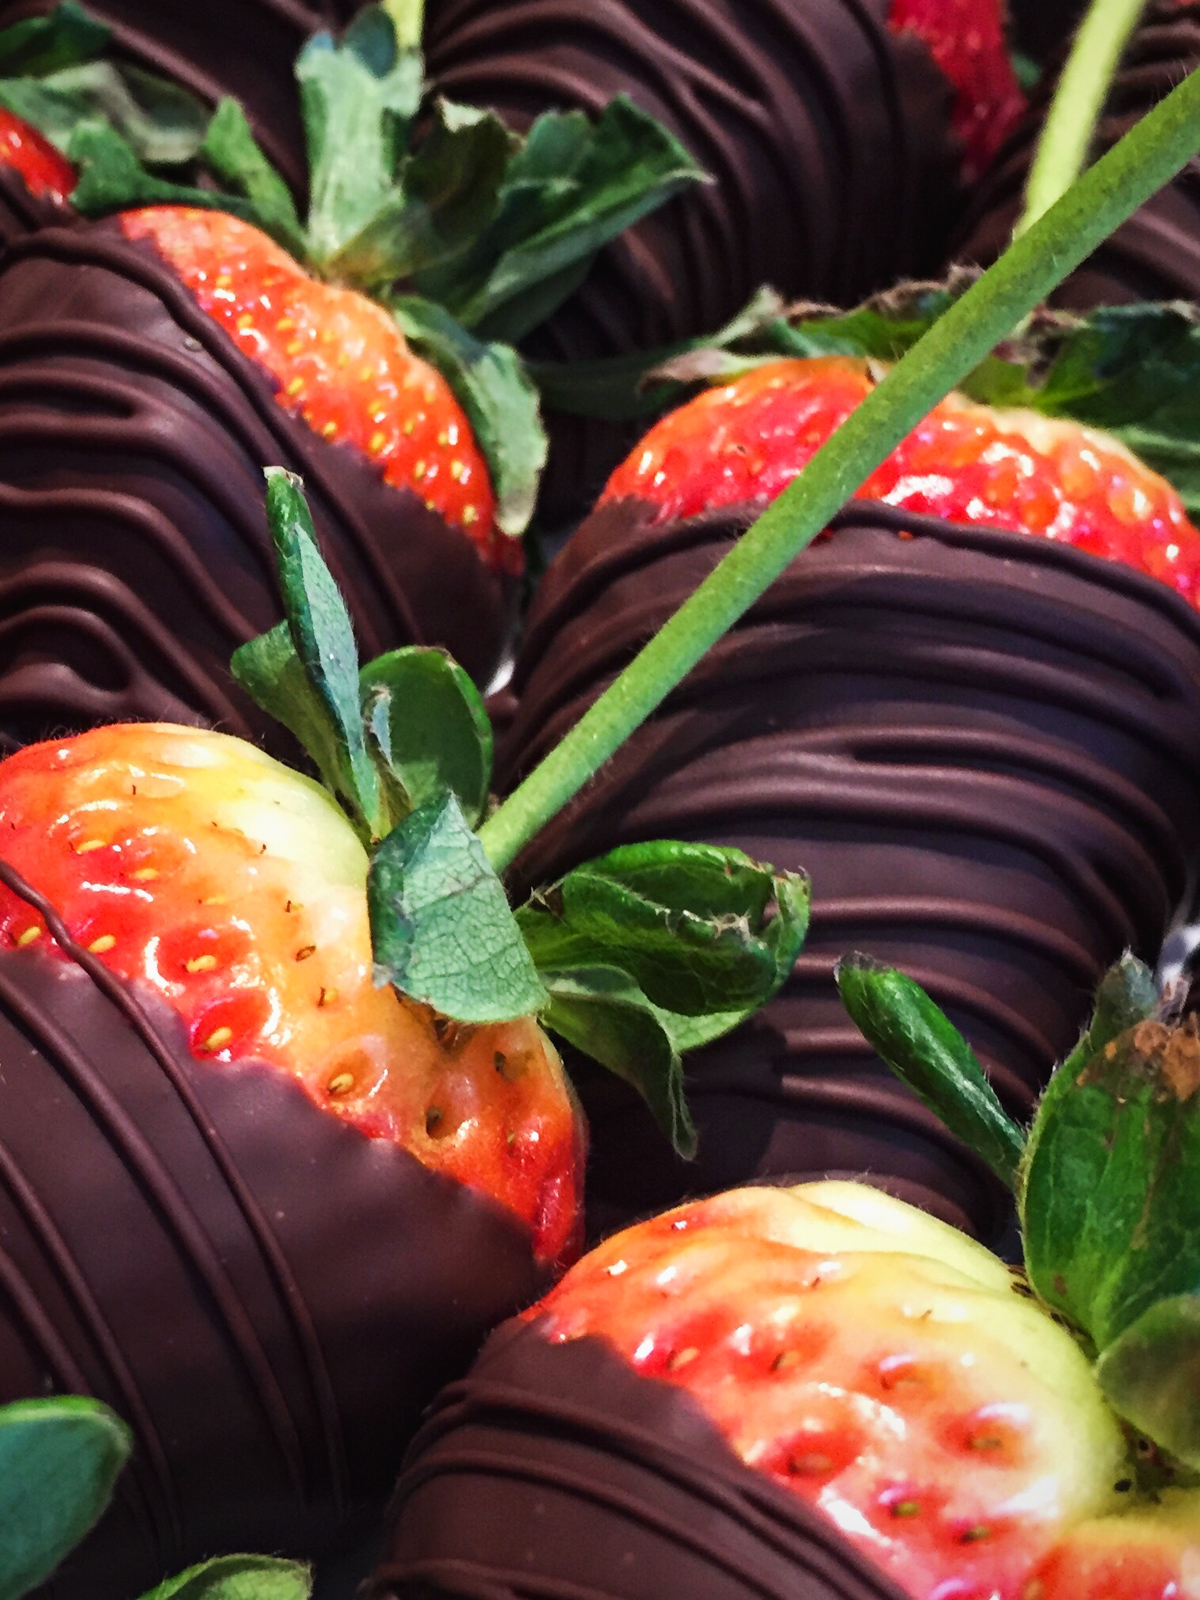 2016-02-12-vday-strawberries-2.jpg